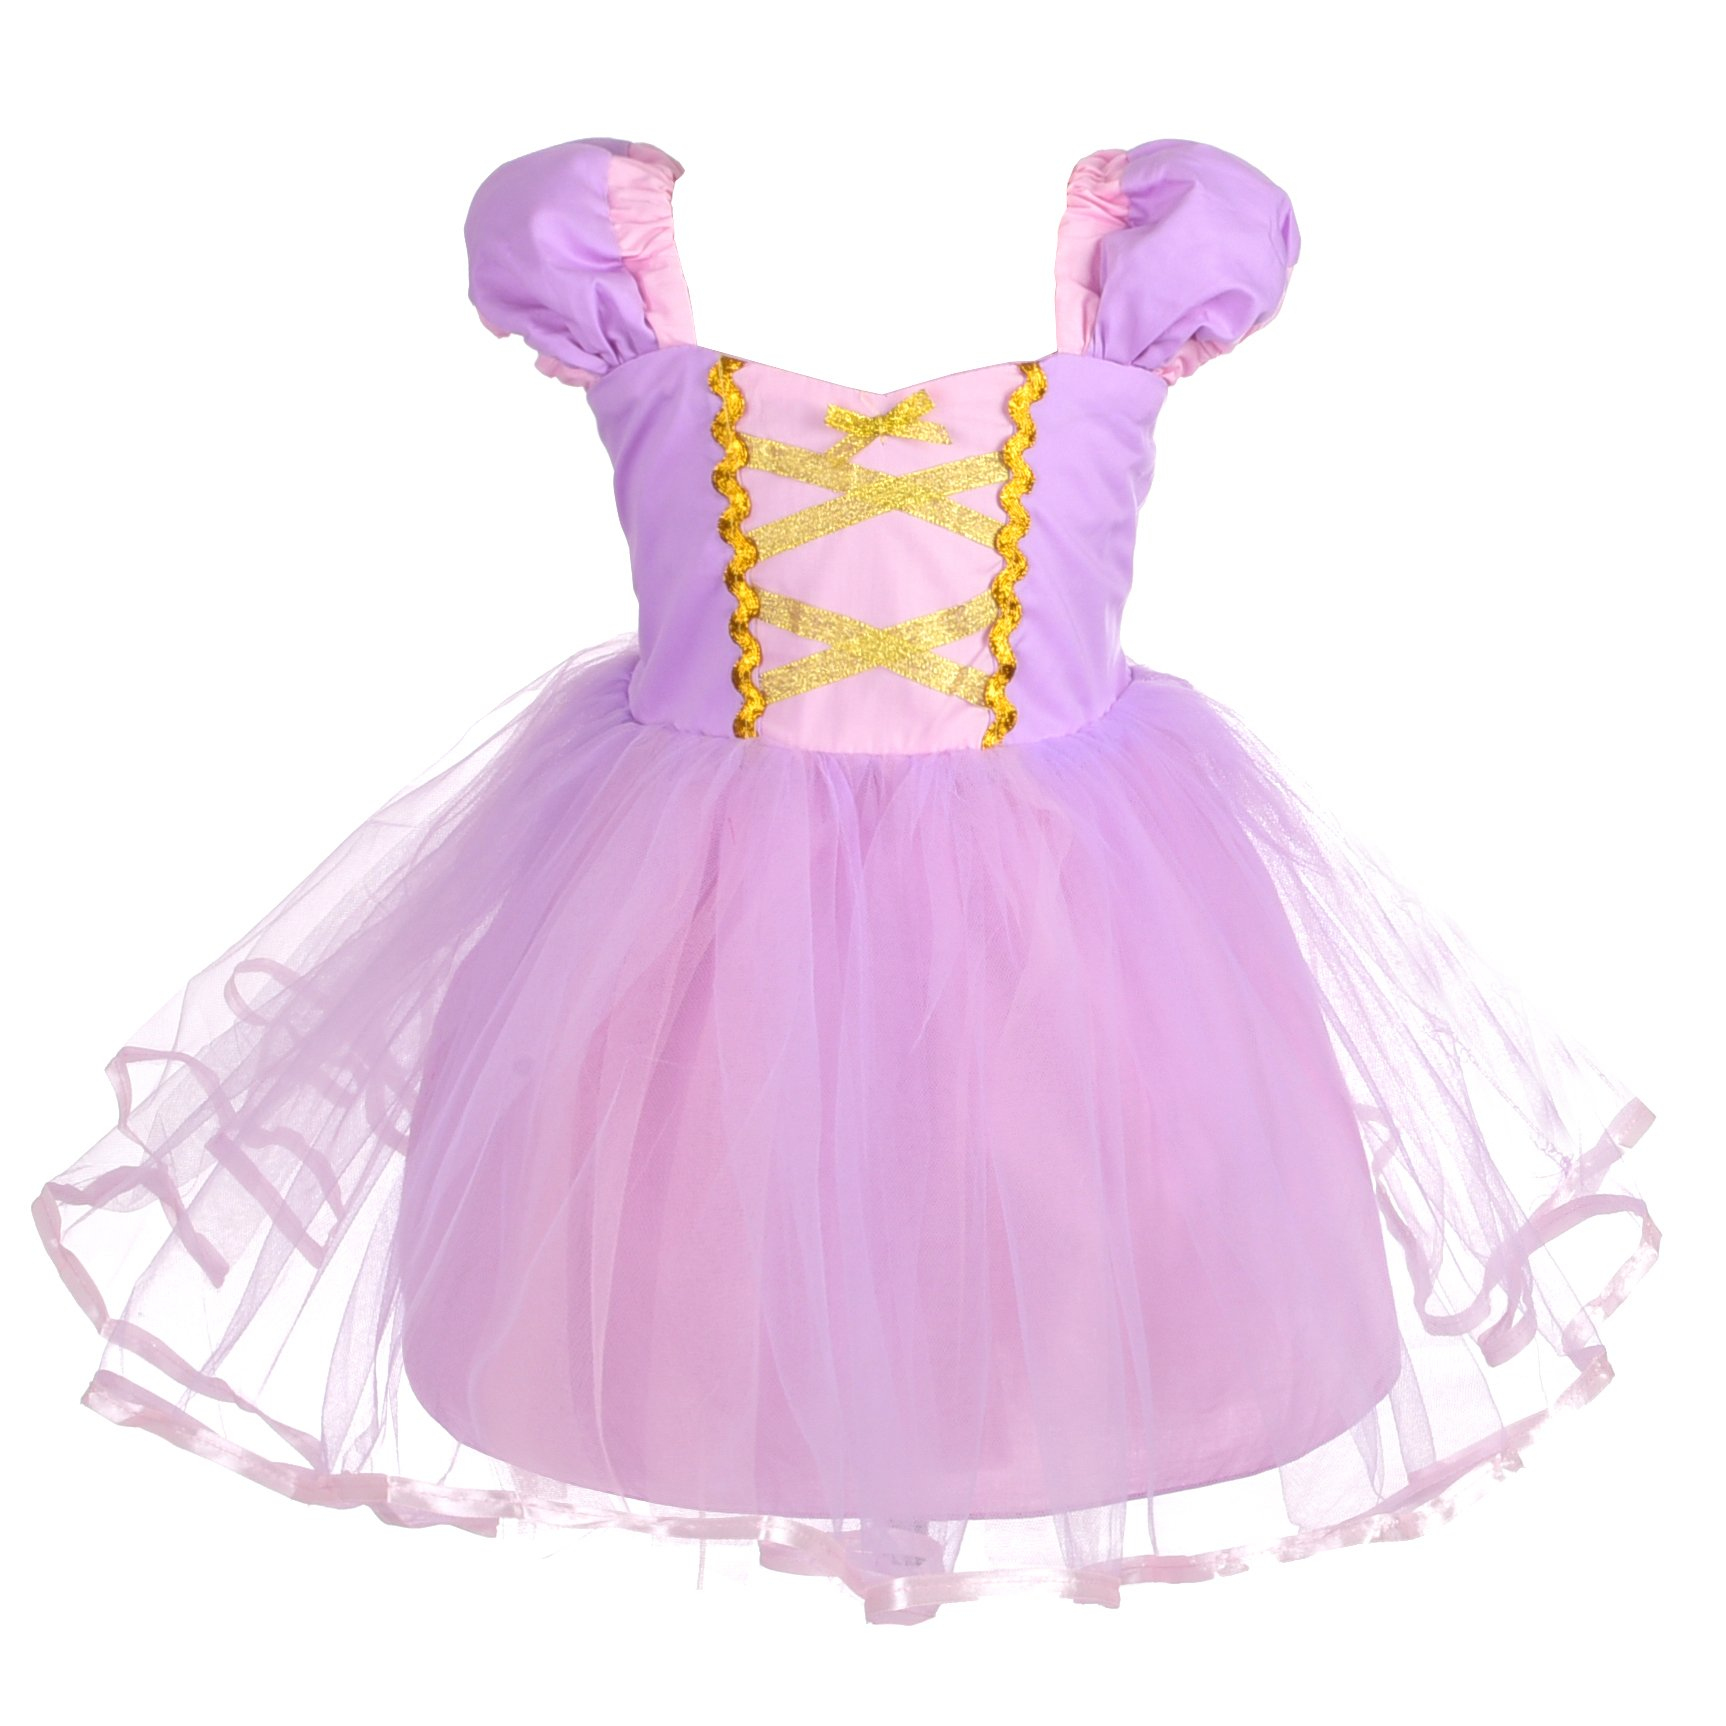 Dressy Daisy Girls Princess Rapunzel Dress Costumes for Toddler Girls Halloween Fancy Party Dress Size 4T by Dressy Daisy (Image #1)